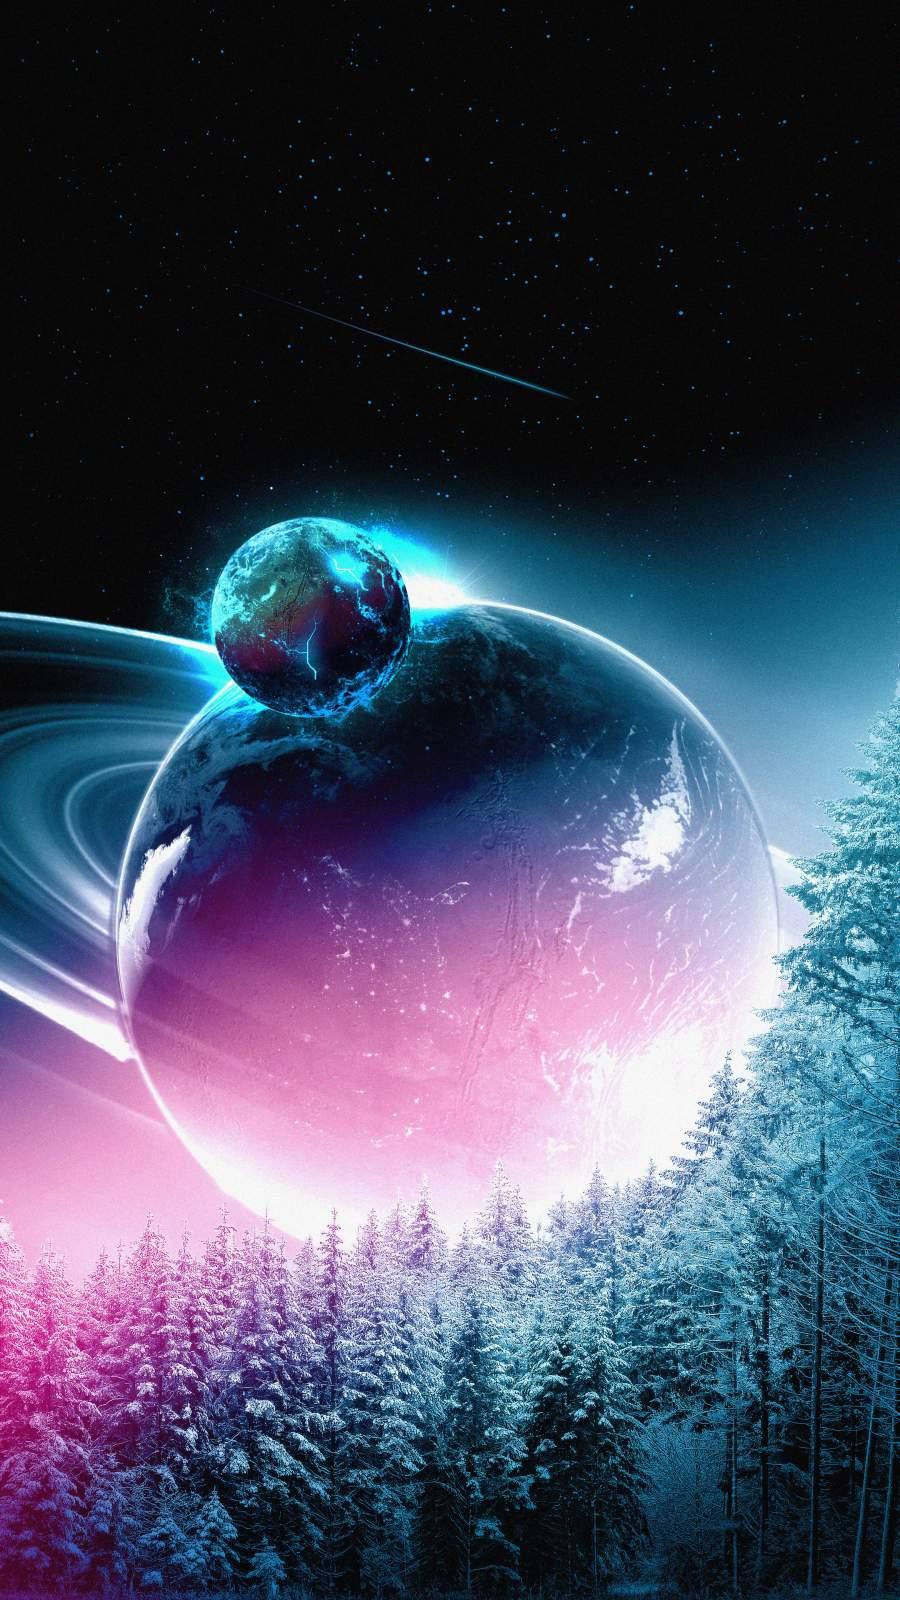 Colliding Planets Amoled